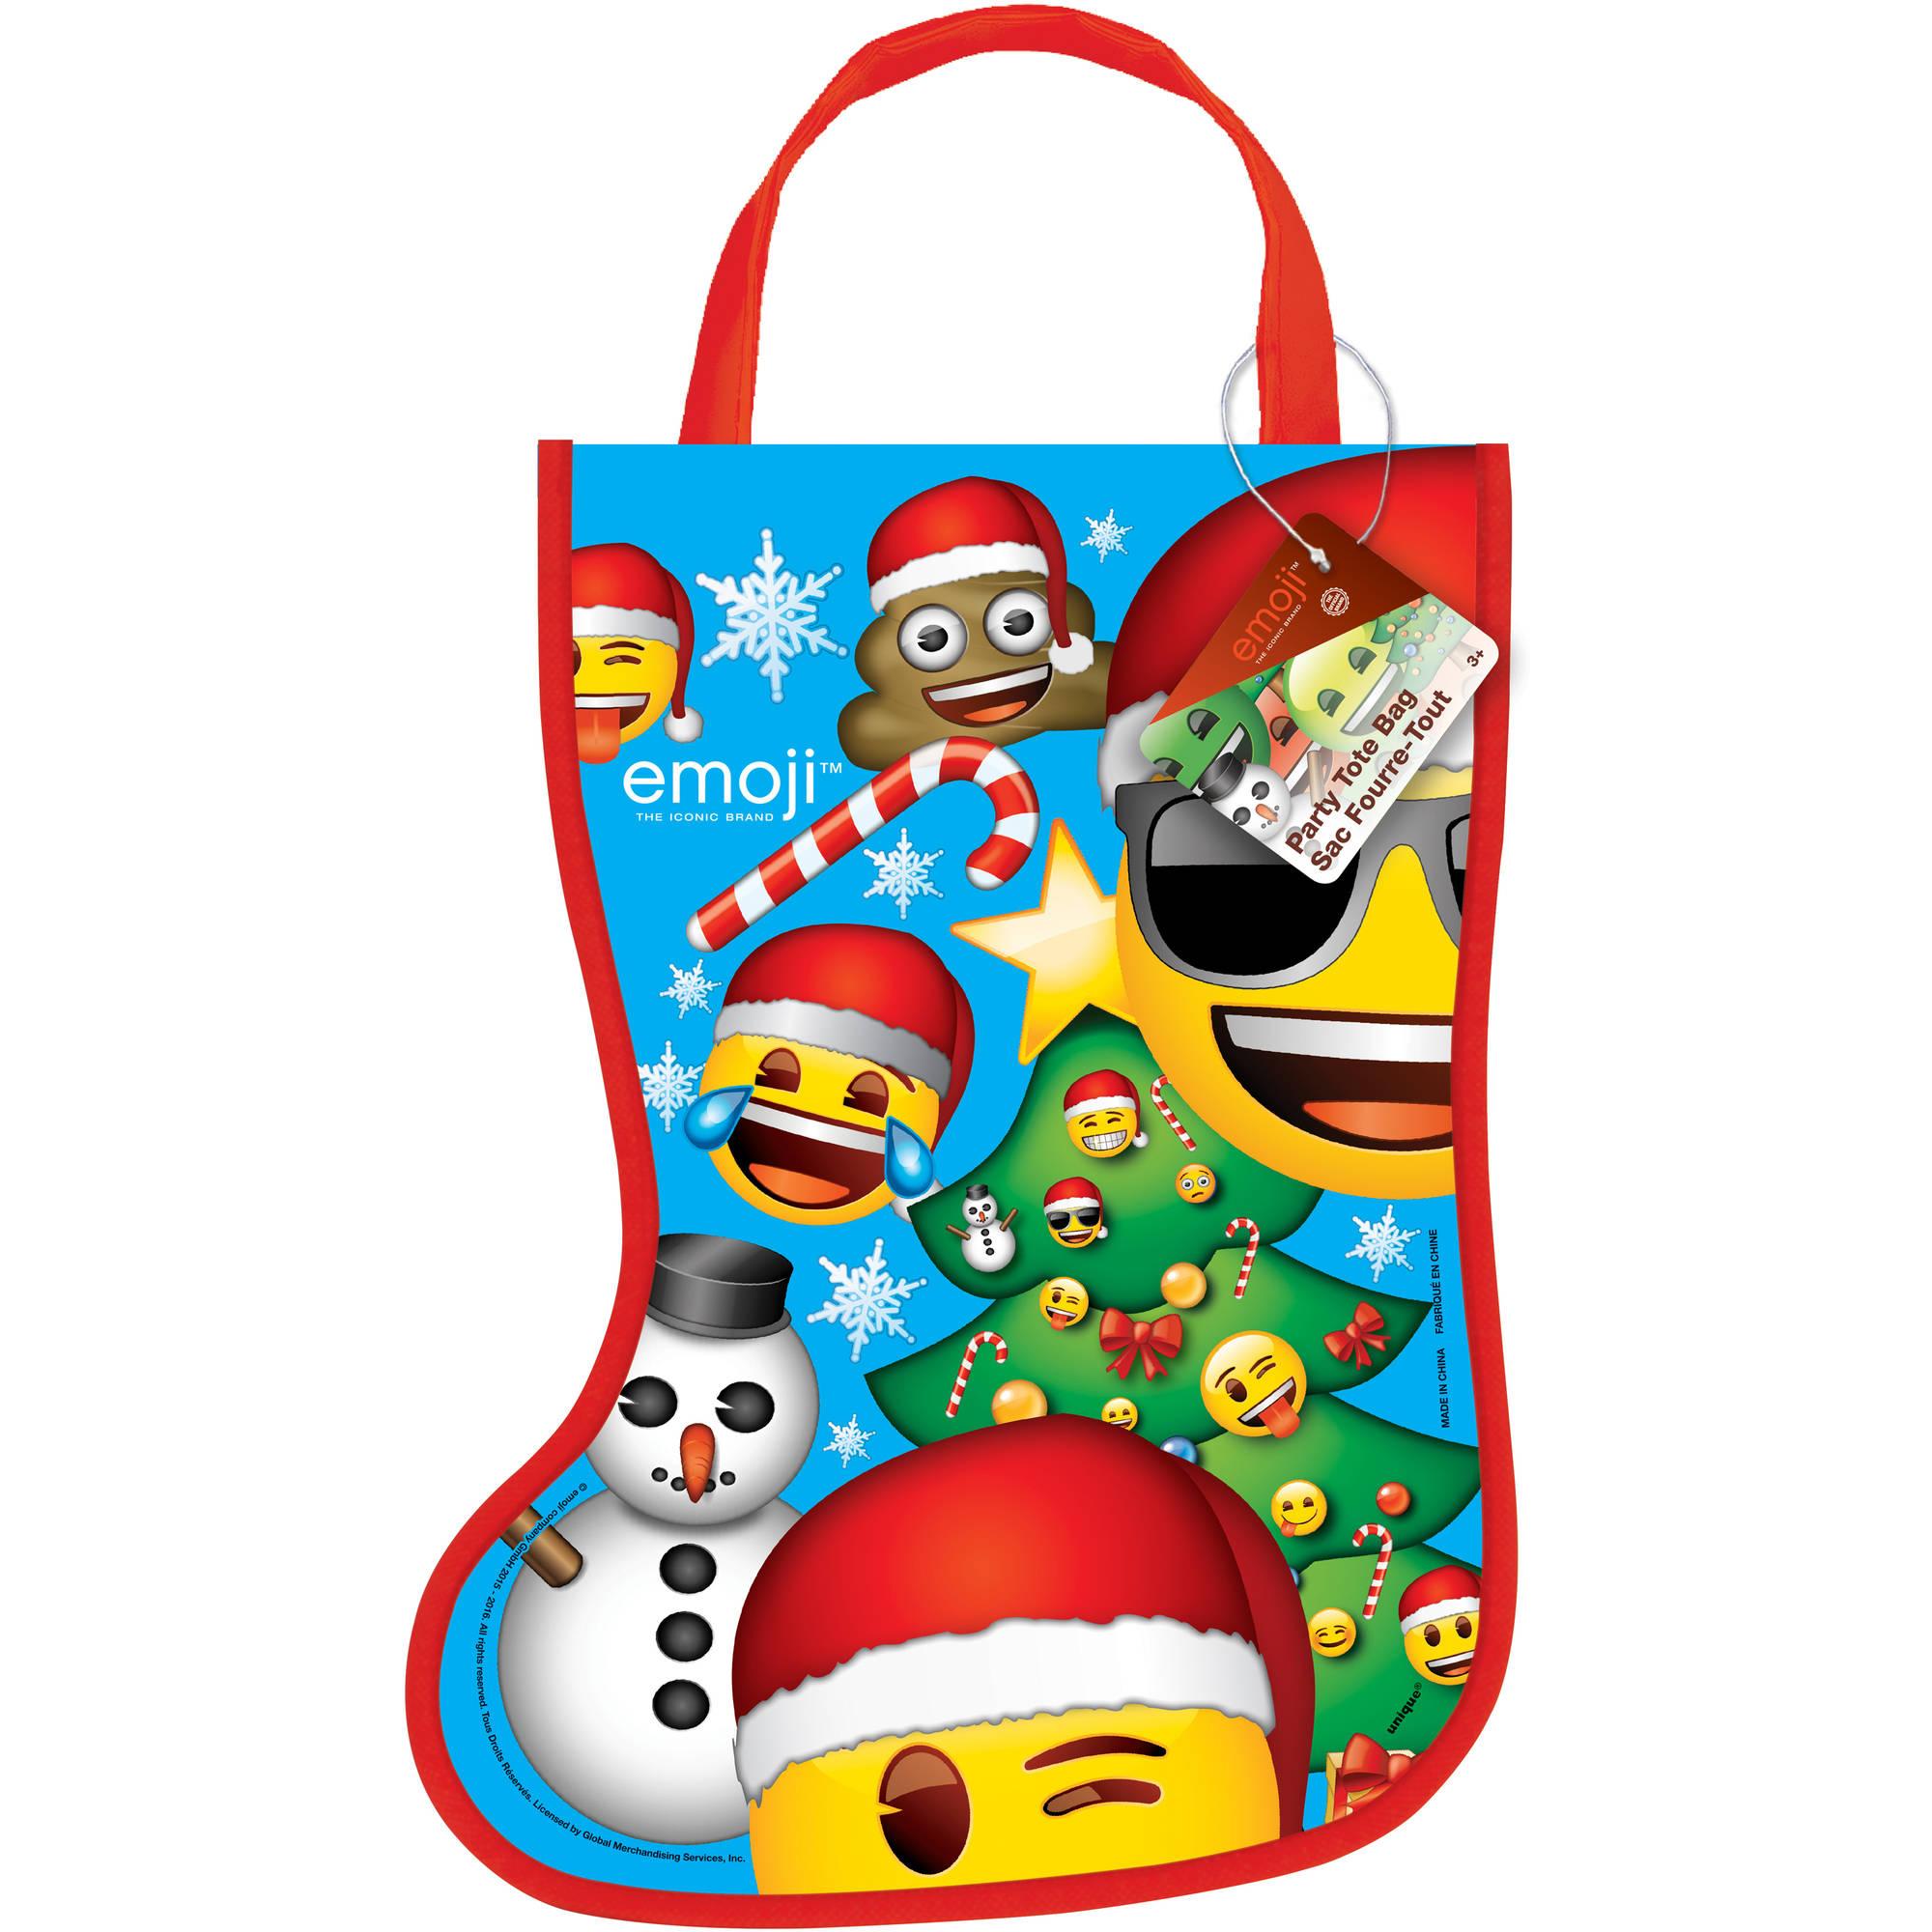 Emoji Christmas Stocking Goodie Bag, 13 x 9.5 in, 1ct